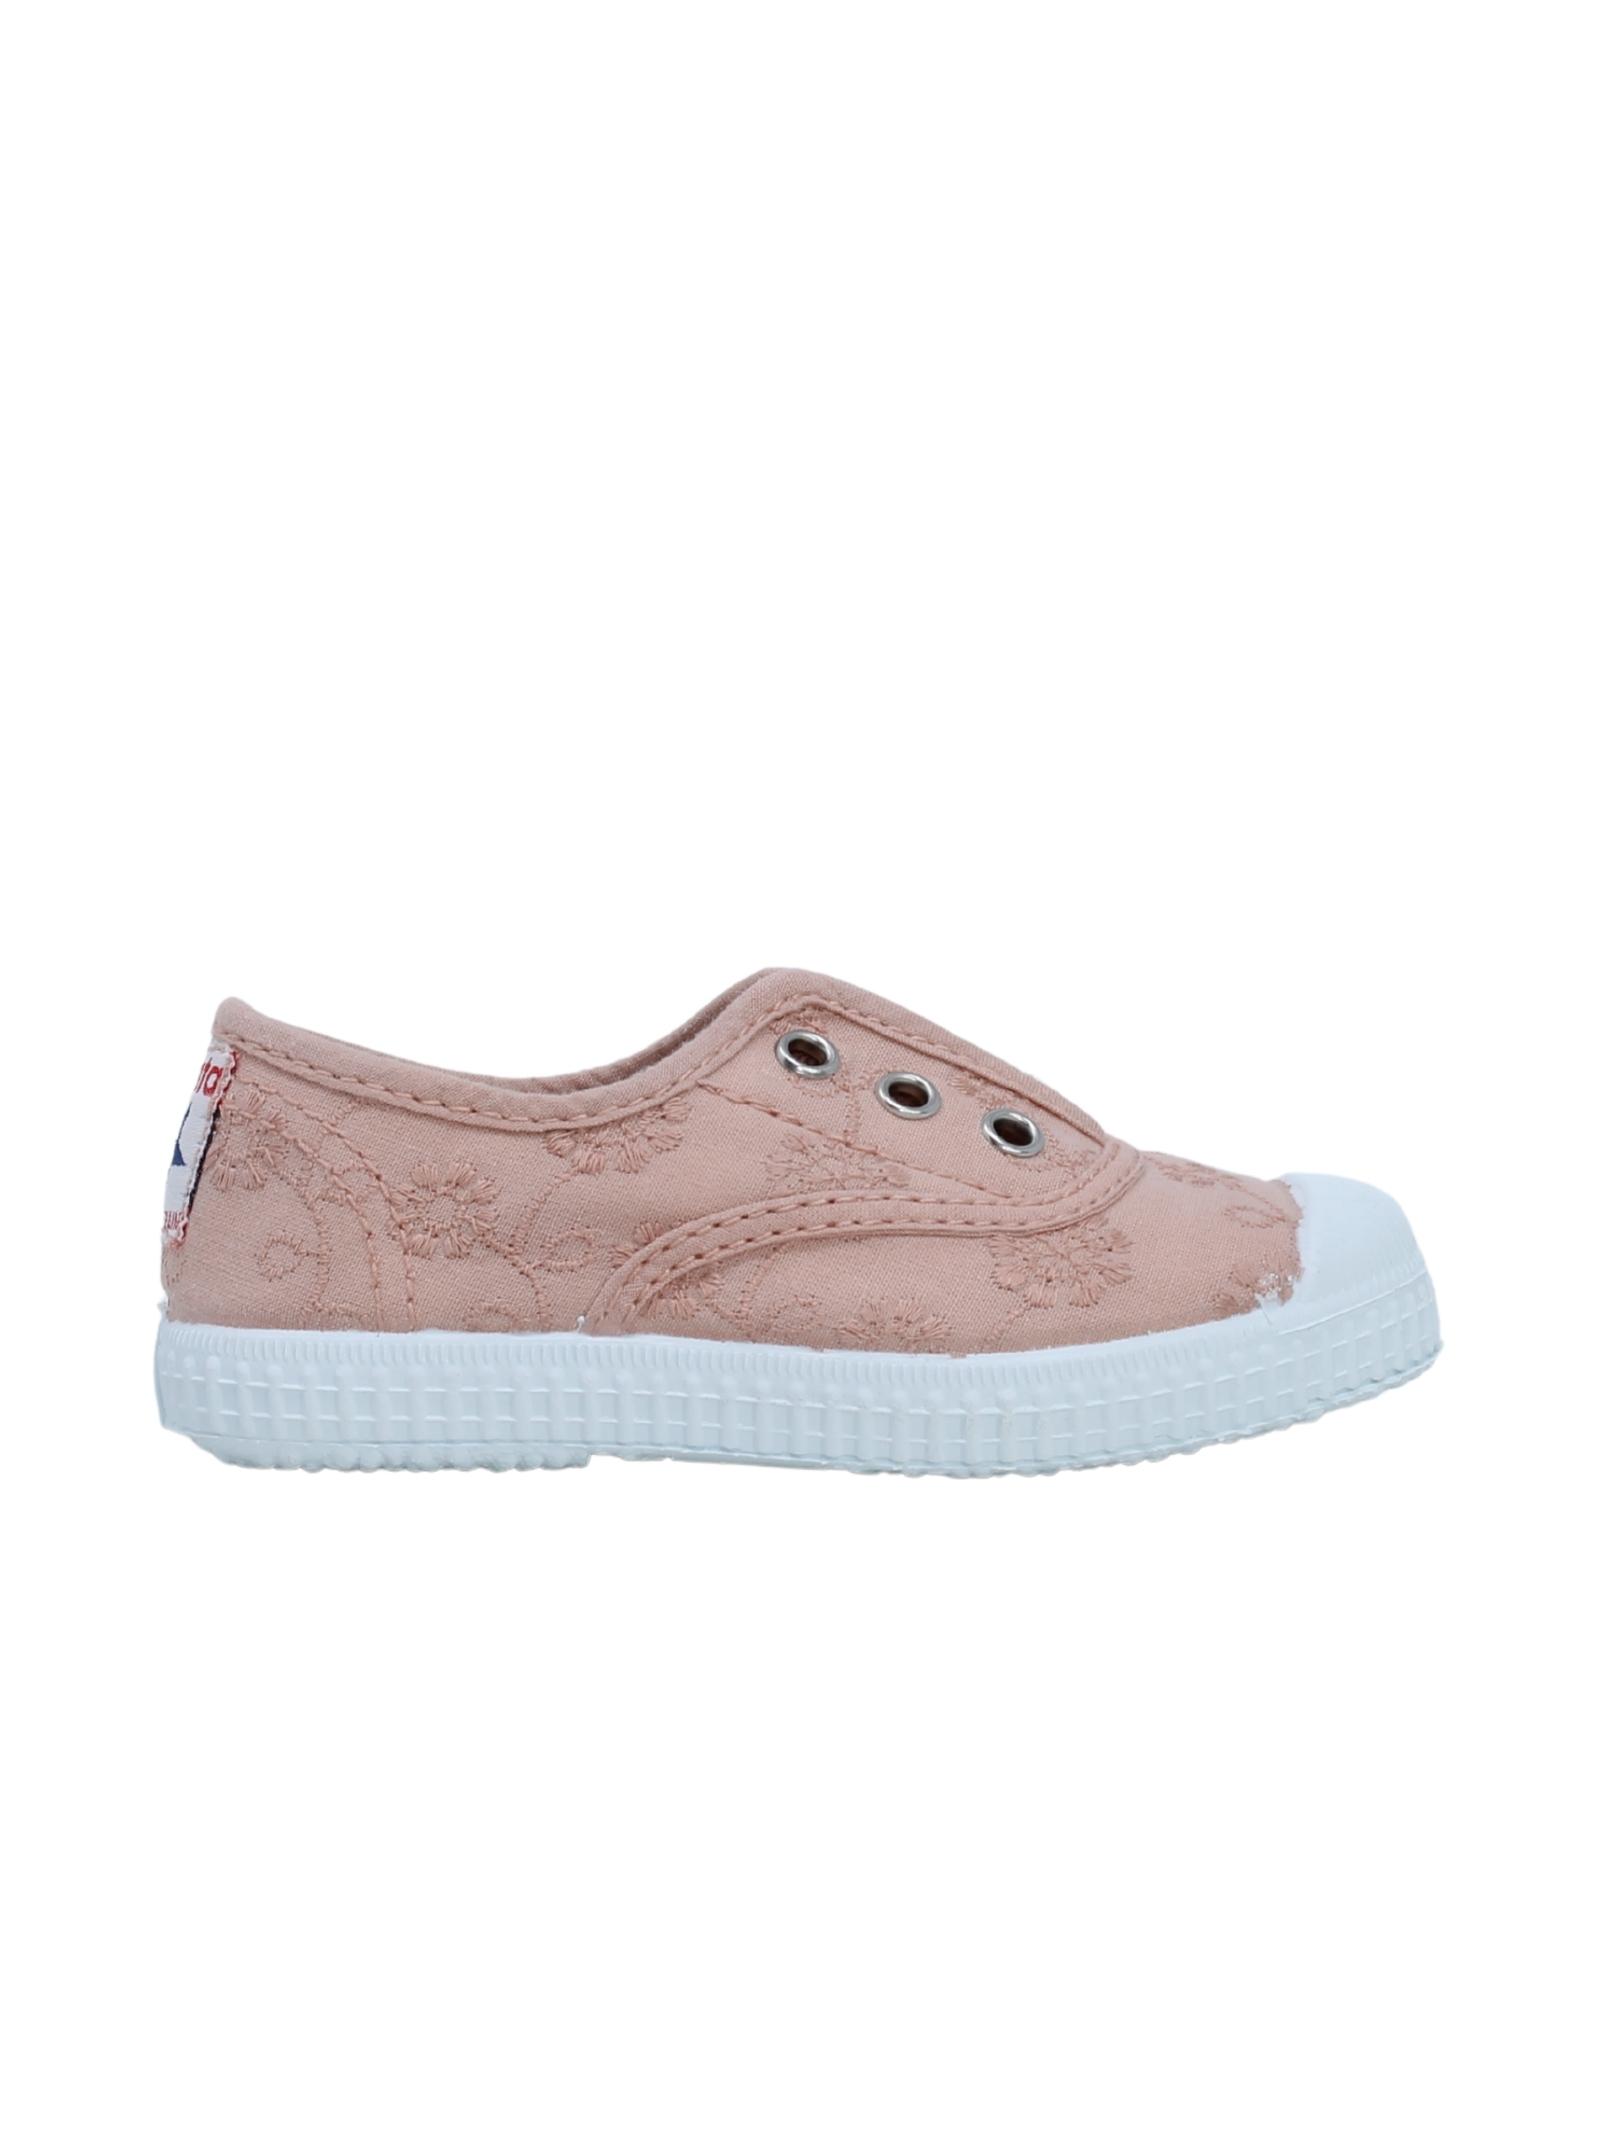 Sneakers Ricami CIENTA | Scarpe in tela | 70998142